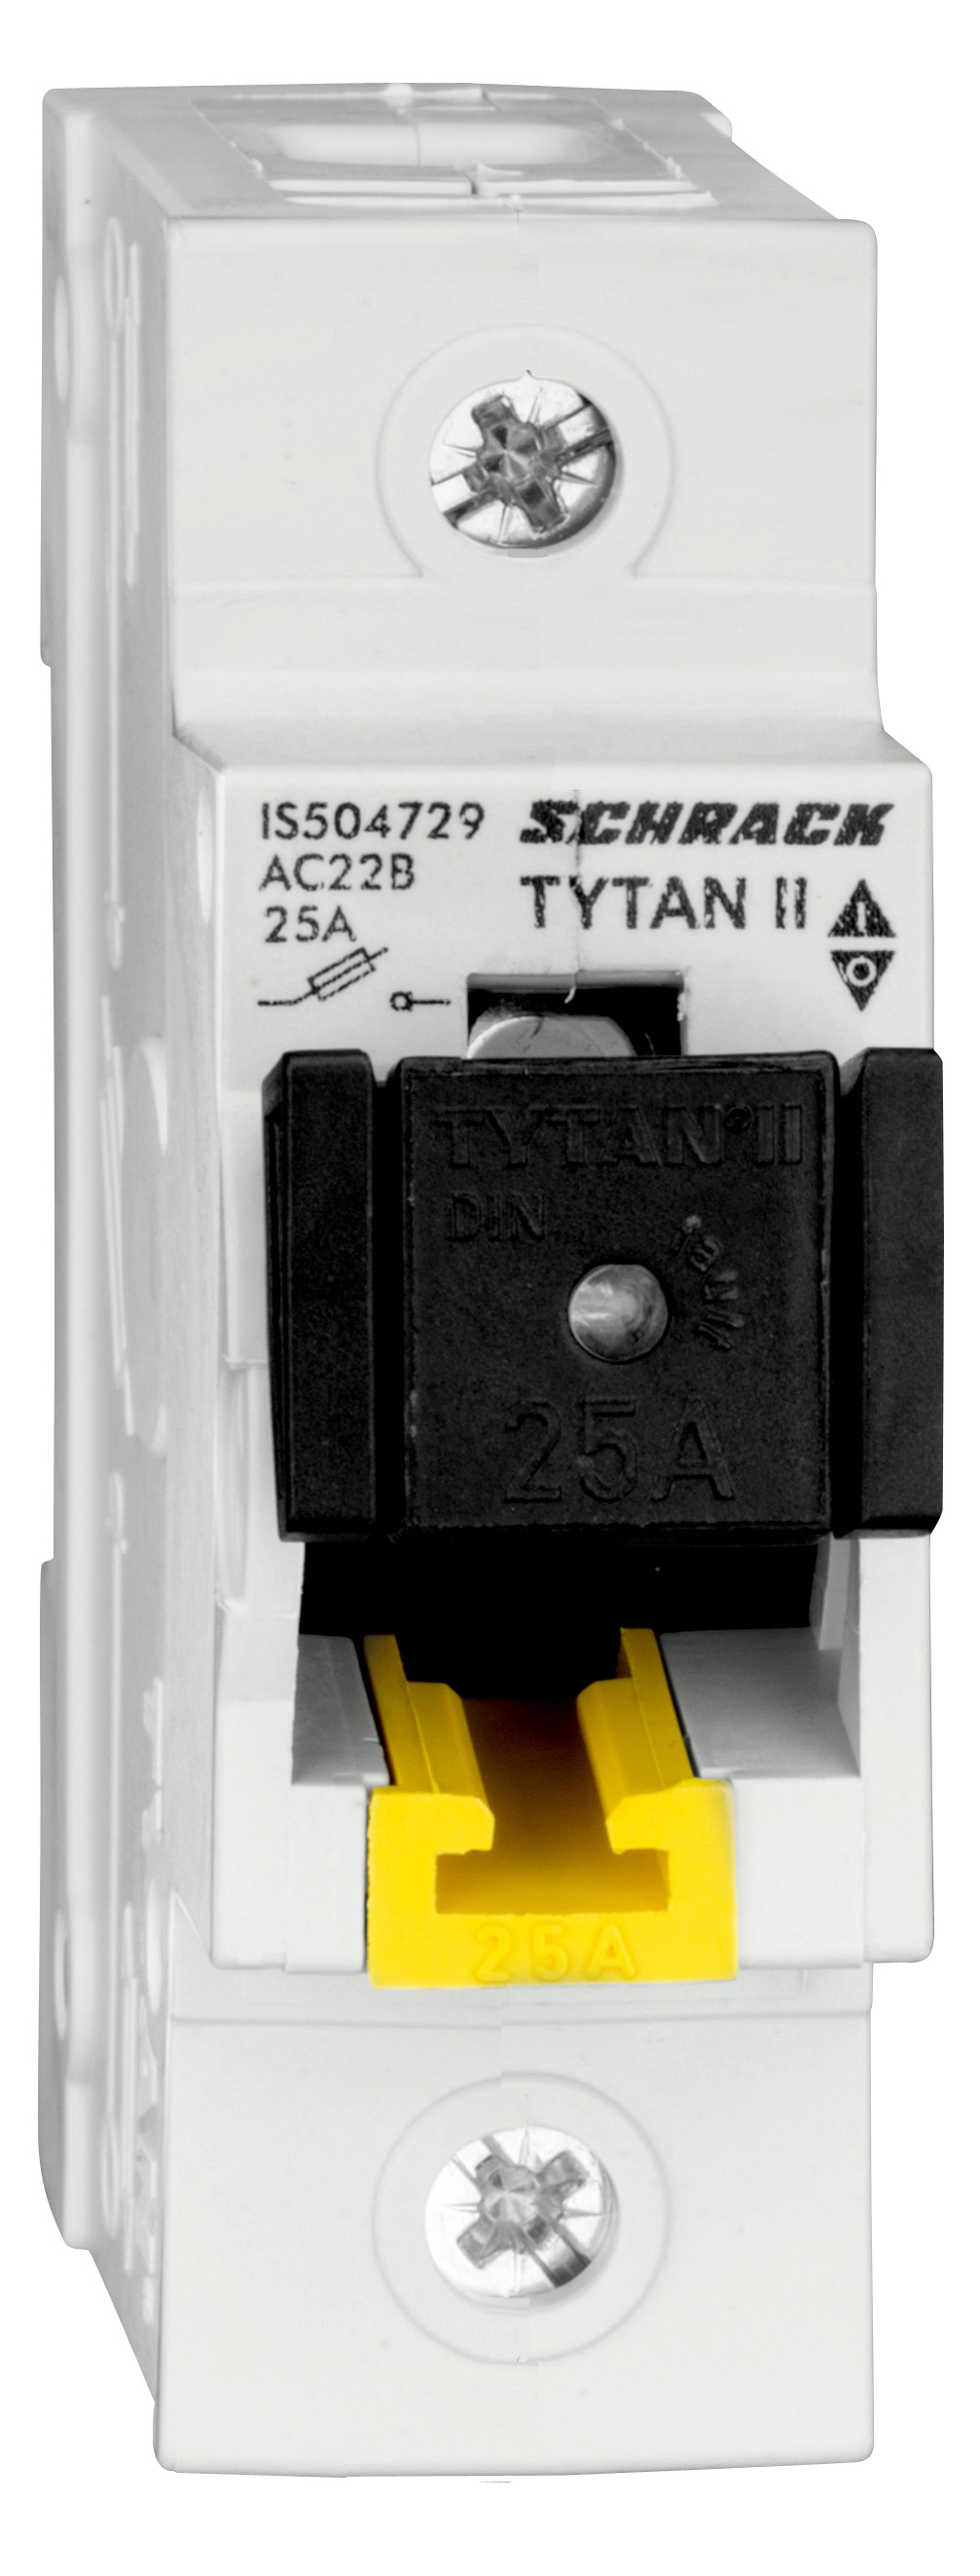 1 Stk TYTAN II, Sicherungslasttrennschalter 1-polig, komplett 25A IS504729--